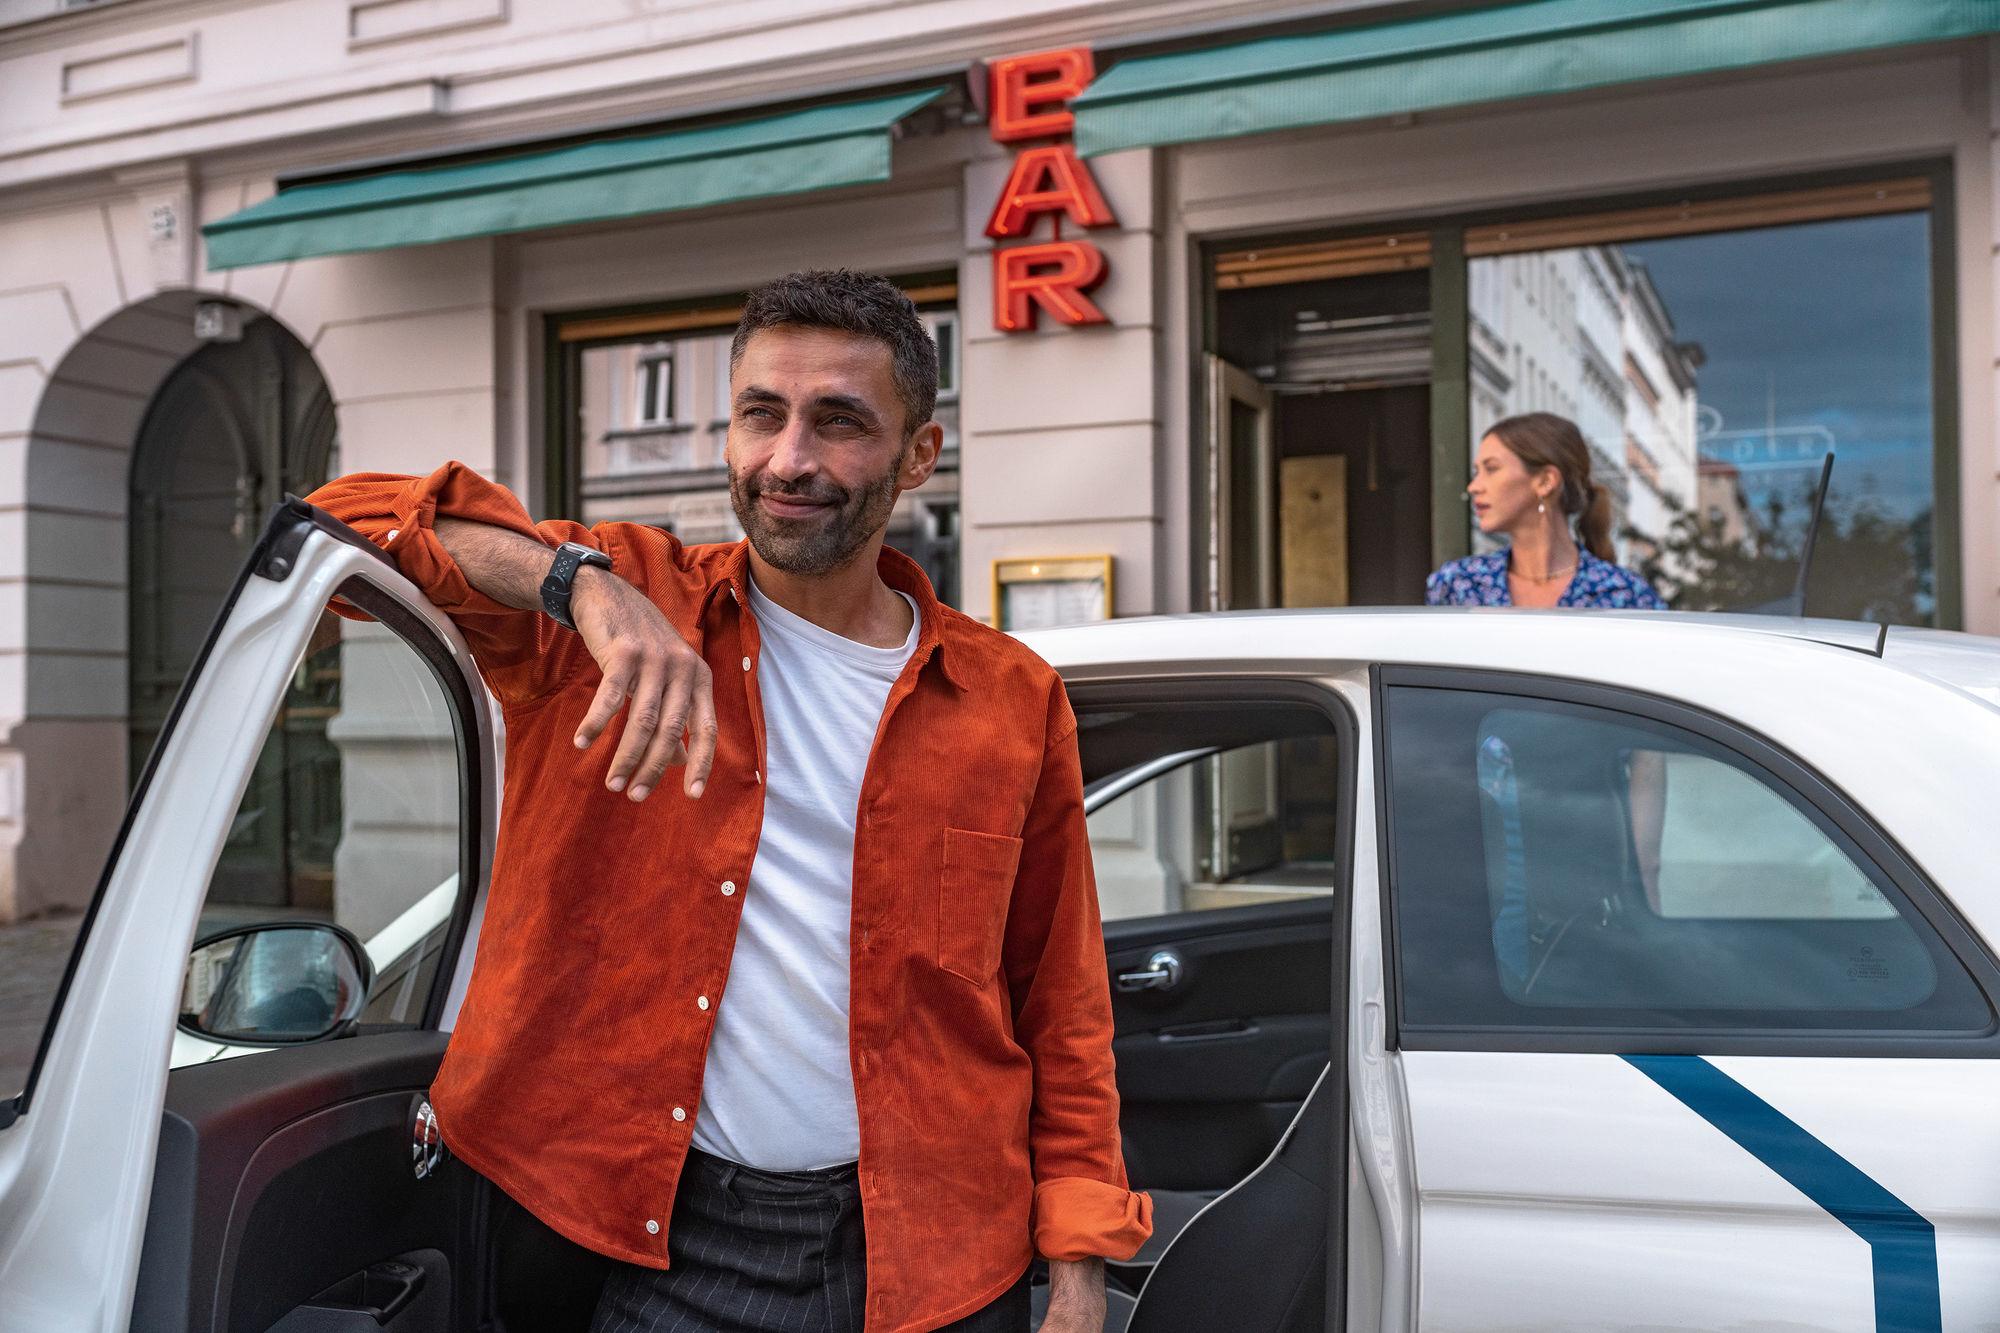 DAVID HAASE c/o TOBIAS BOSCH FOTOMANAGEMENT SHARE NOW FIAT 500